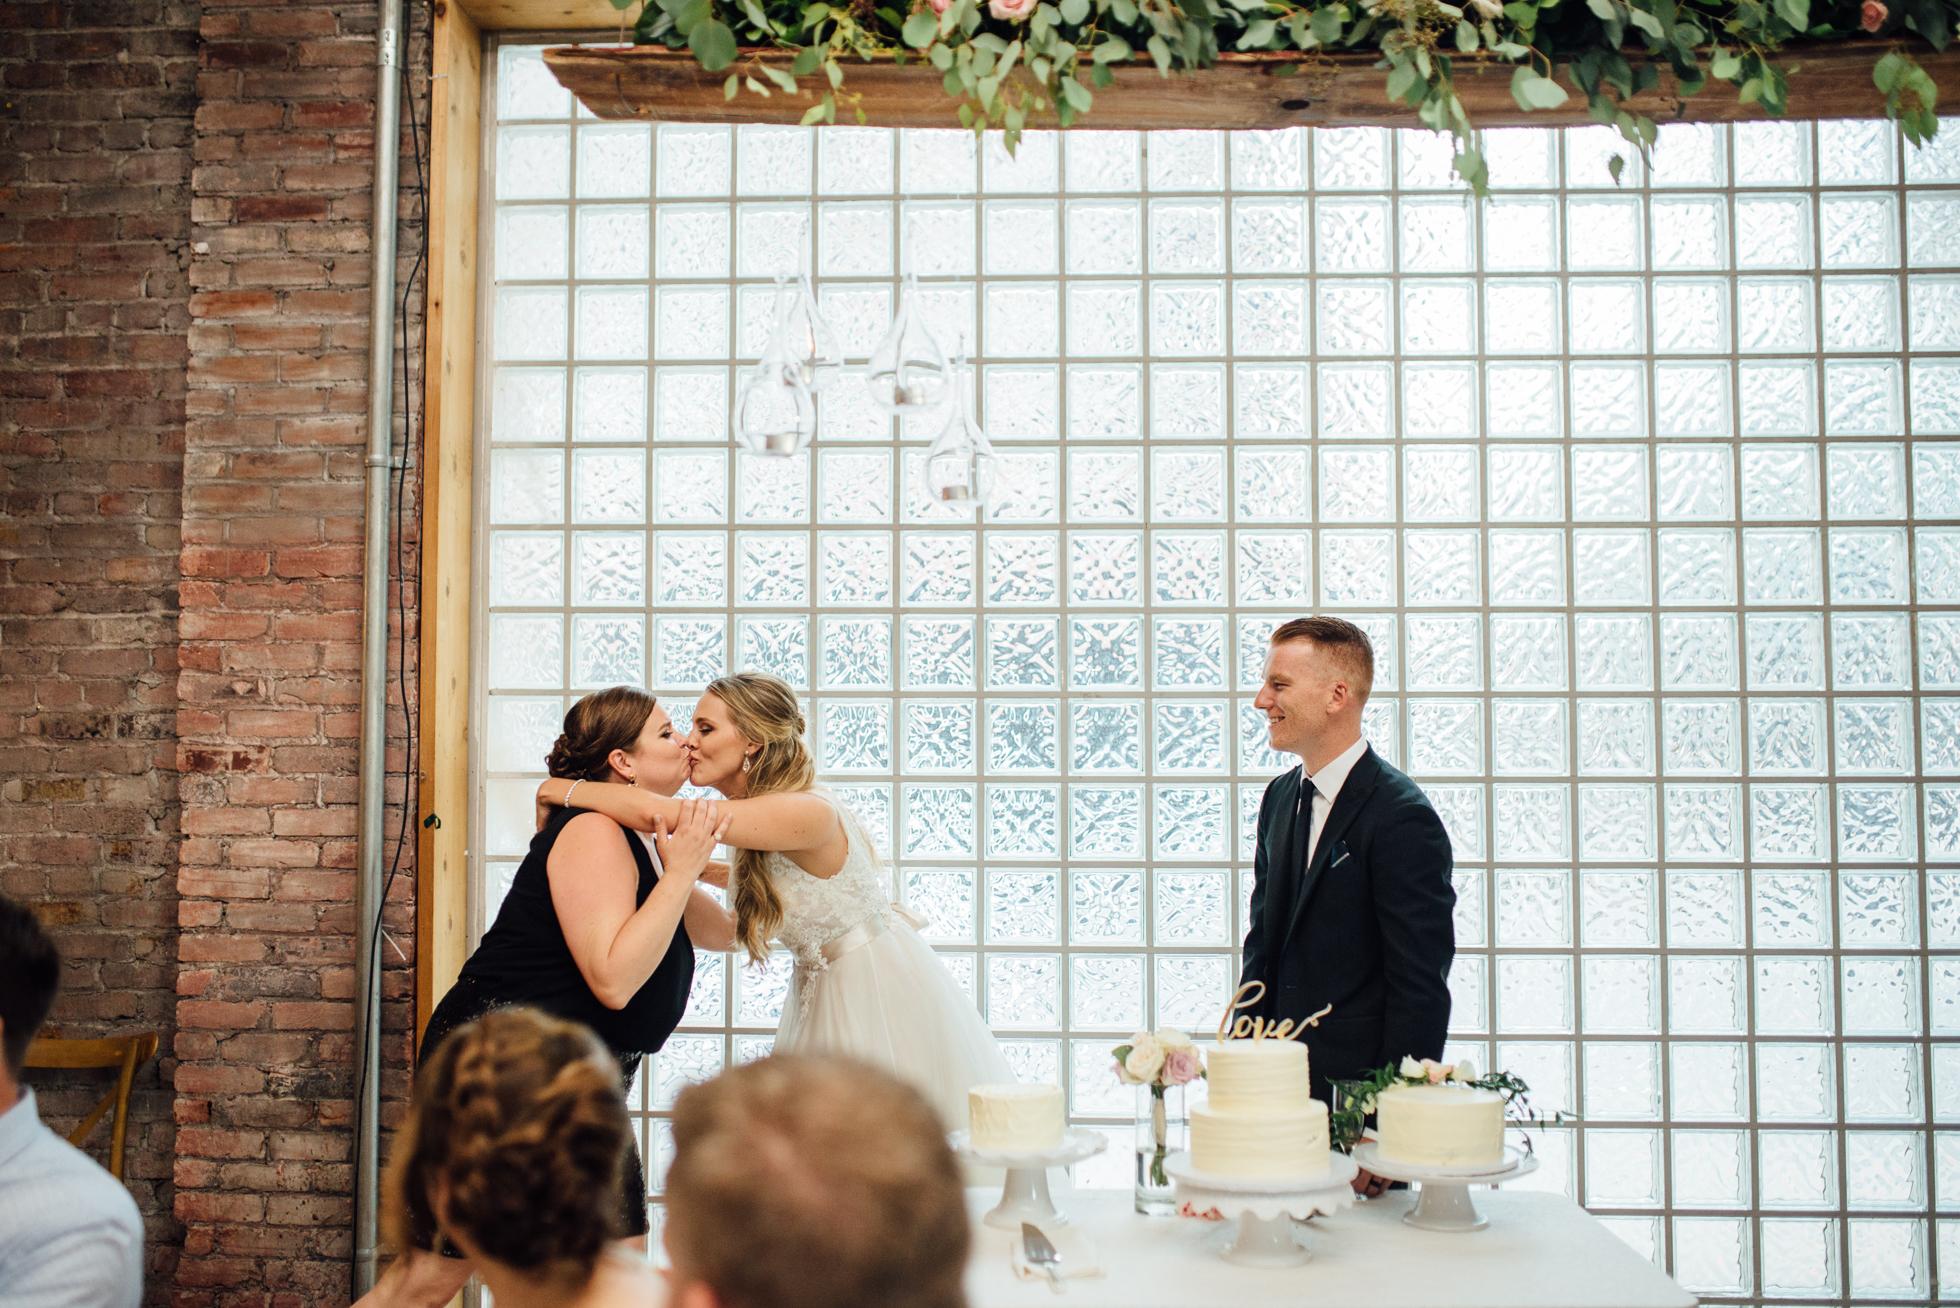 99-Sudbury-Toronto-Wedding-Photography-58.jpg